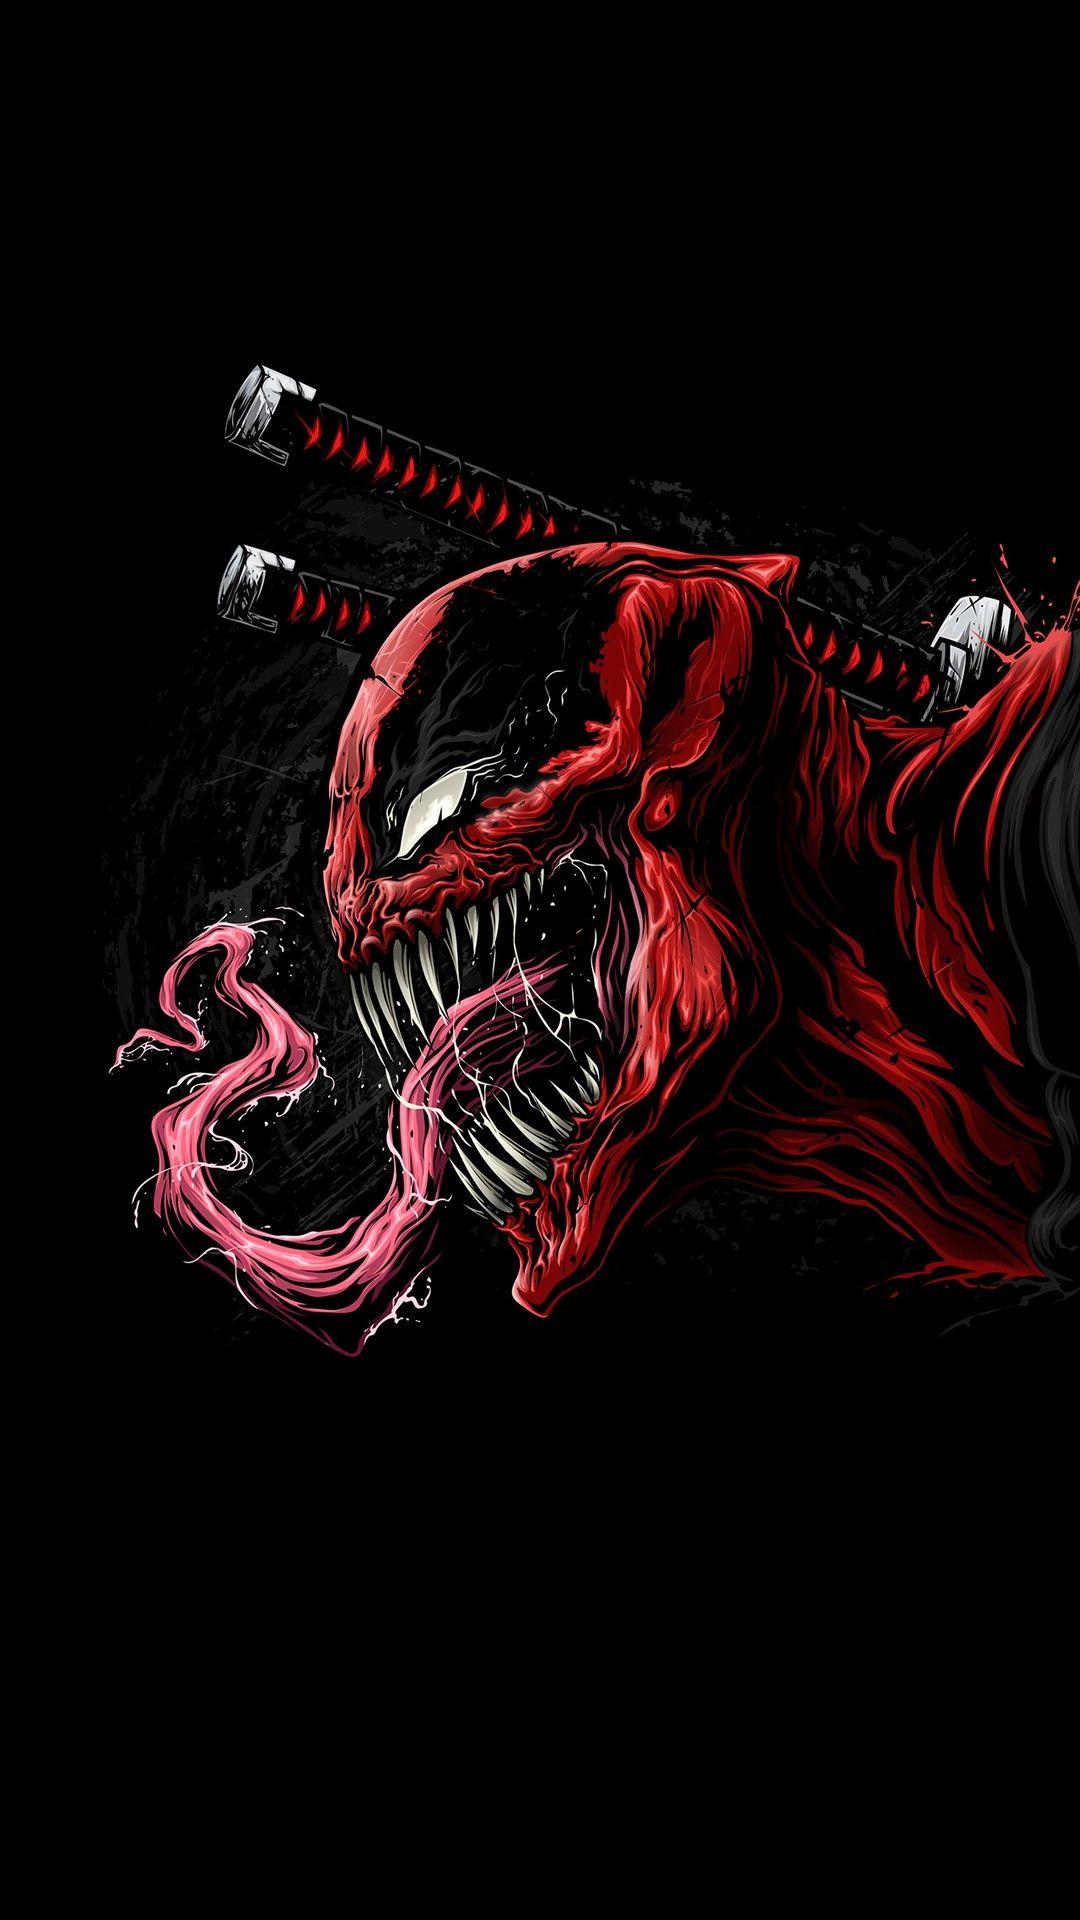 venom deadpool marver sony art black hero scary weapon comics